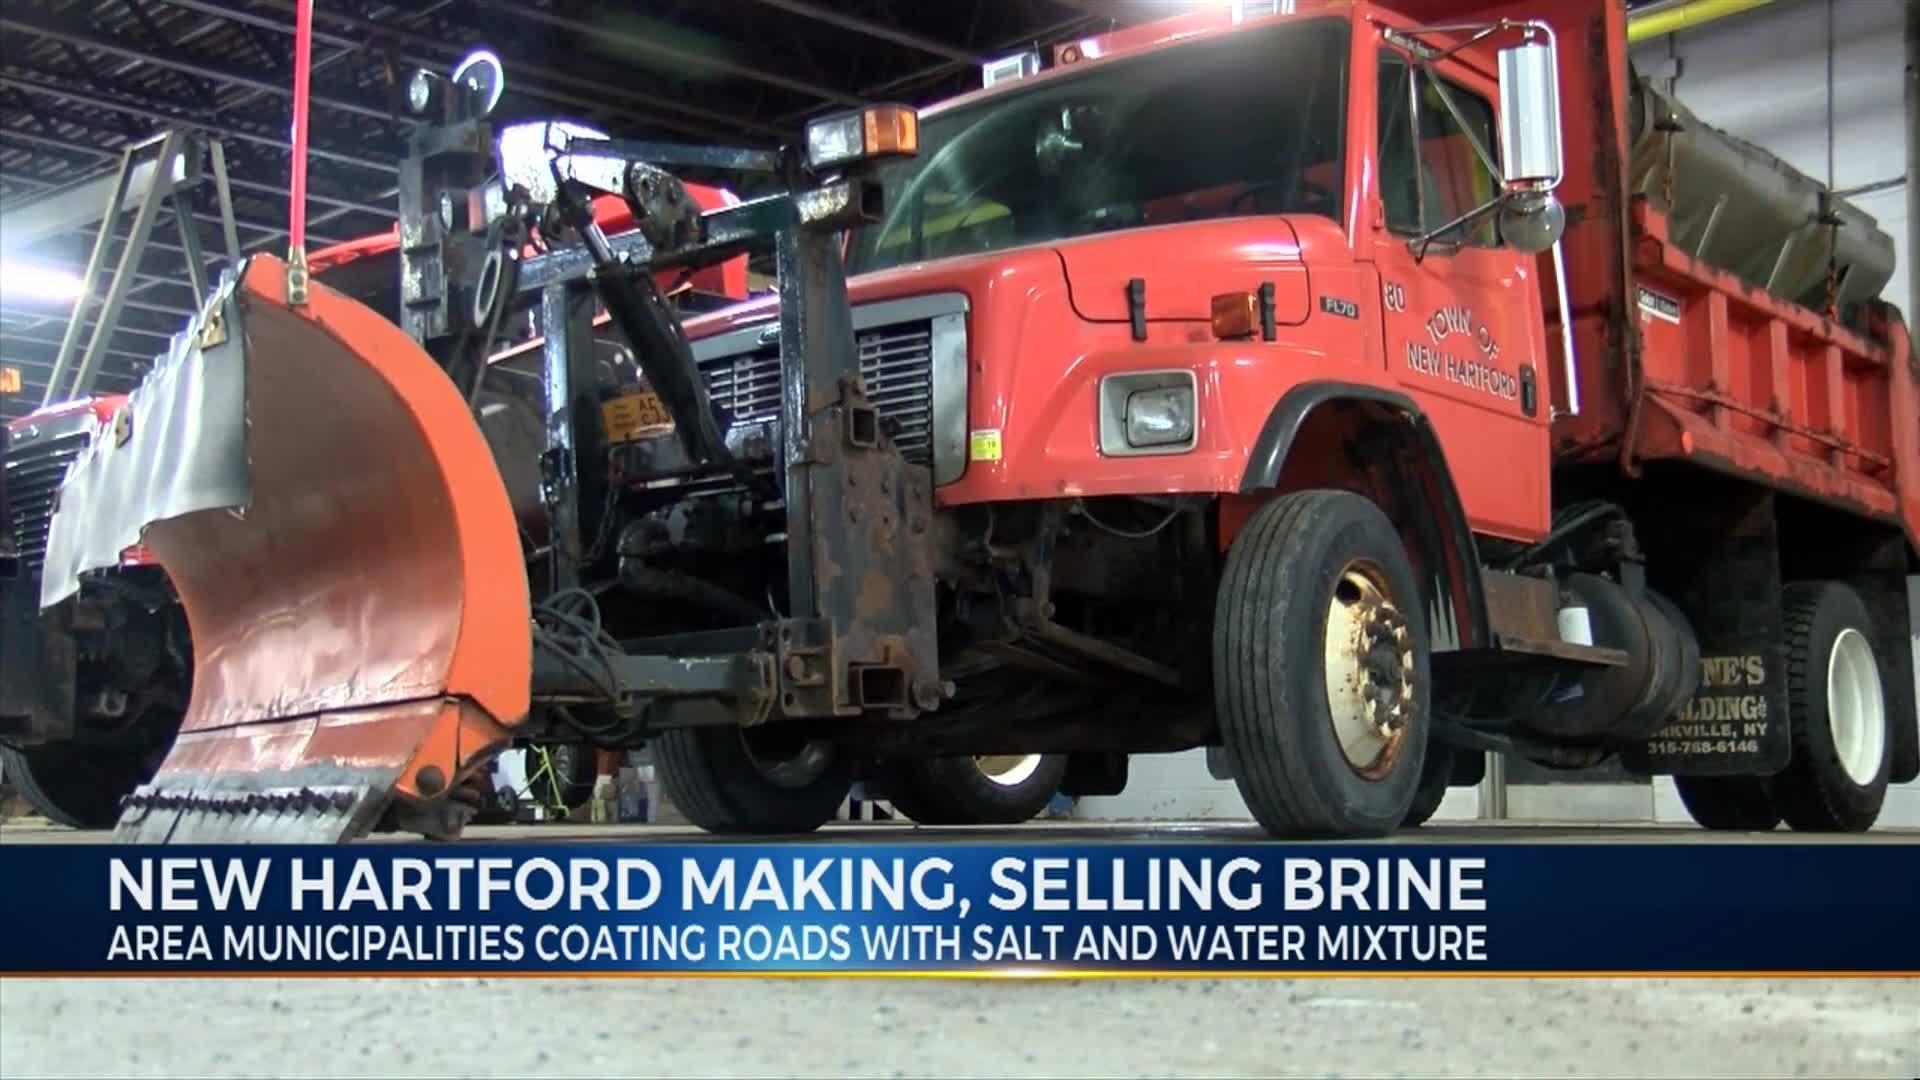 New_Hartford_Making__Selling_Brine_4_20181210231859